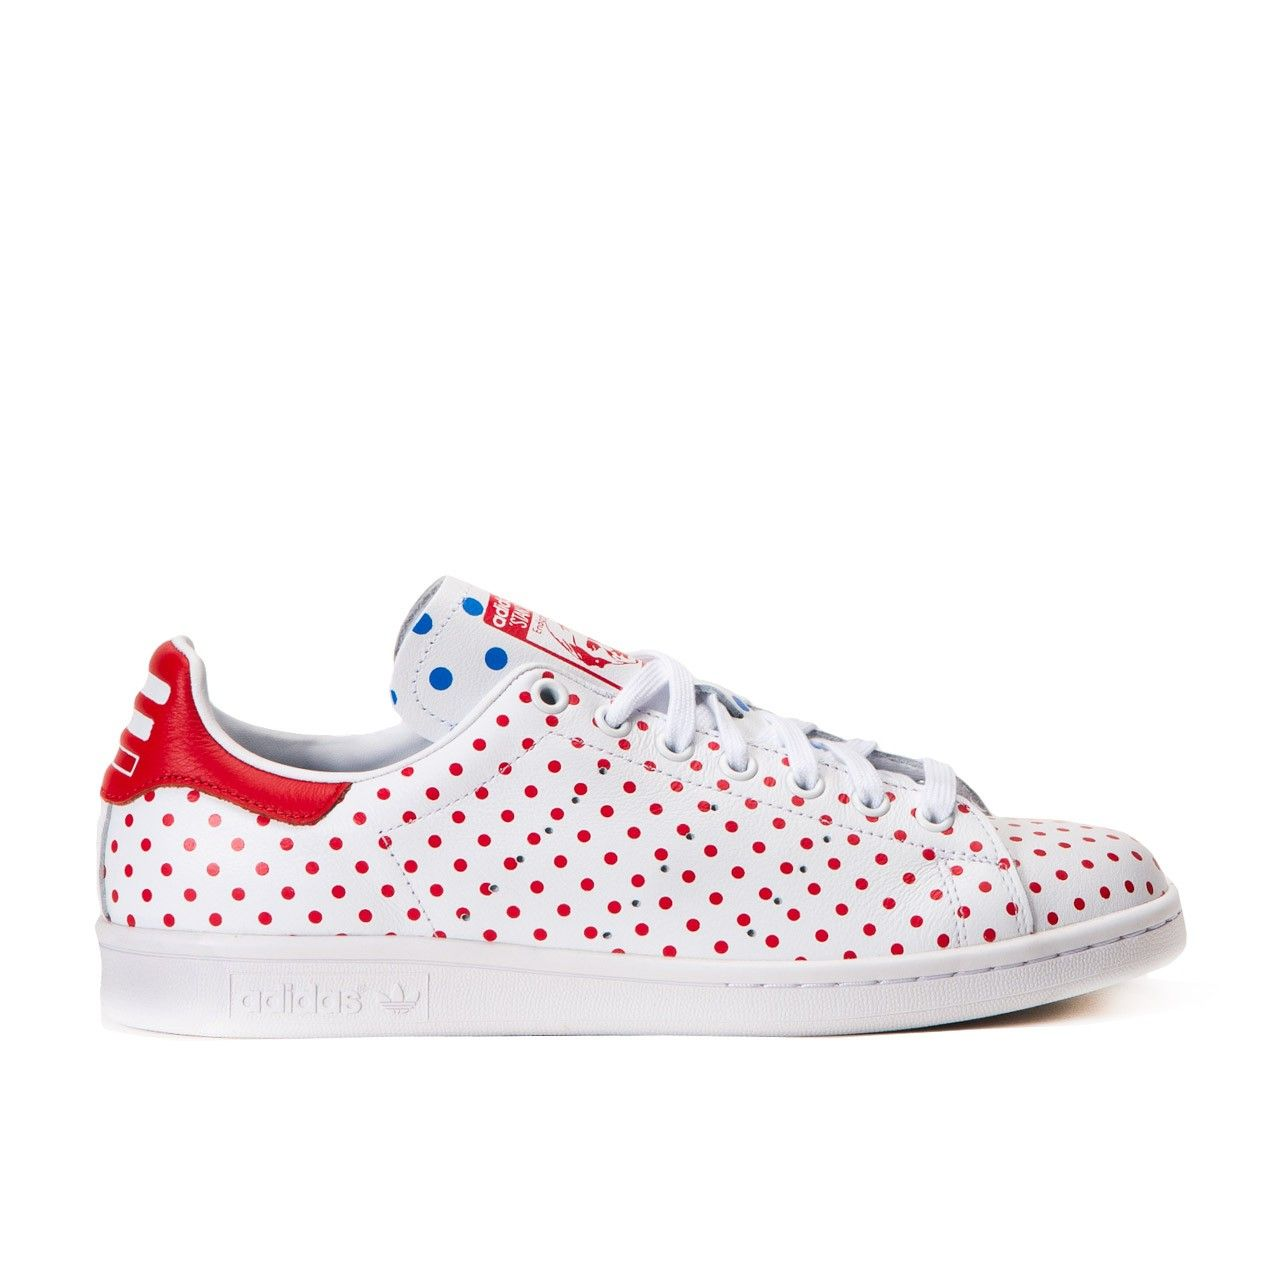 1e0b5b6143a80 Adidas x Pharrell Williams Stan Smith SPD